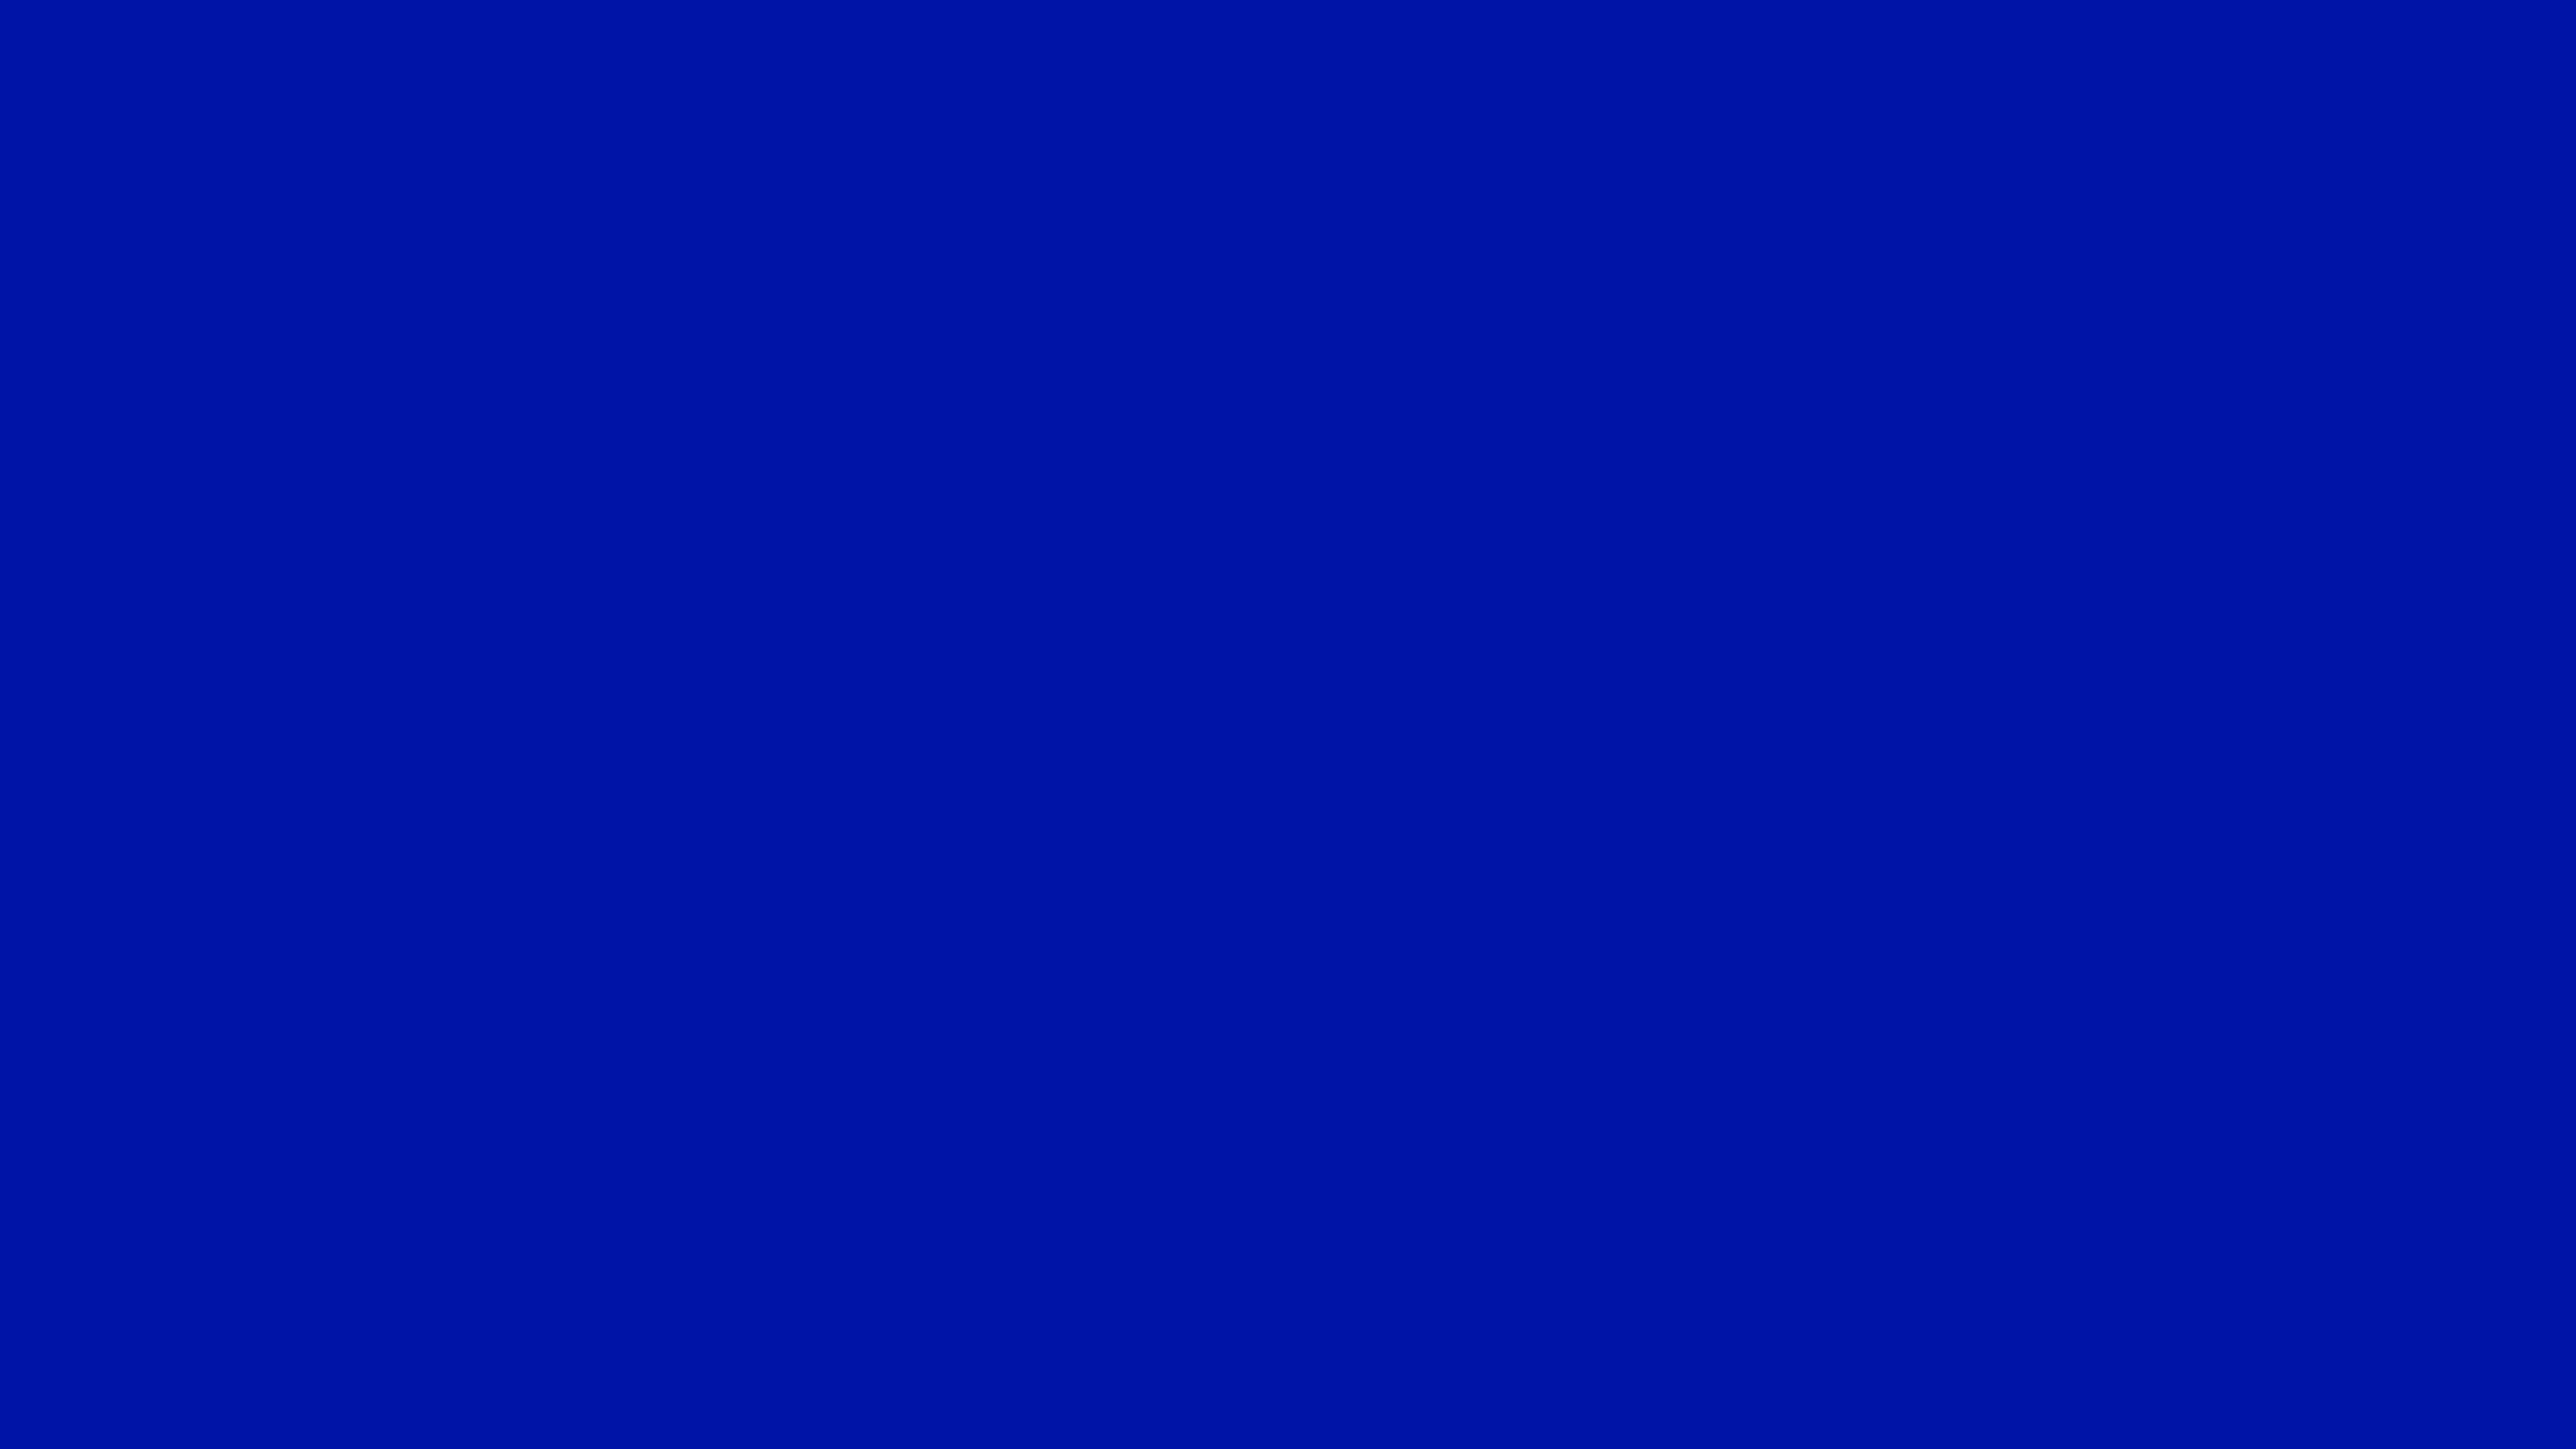 5120x2880 Zaffre Solid Color Background